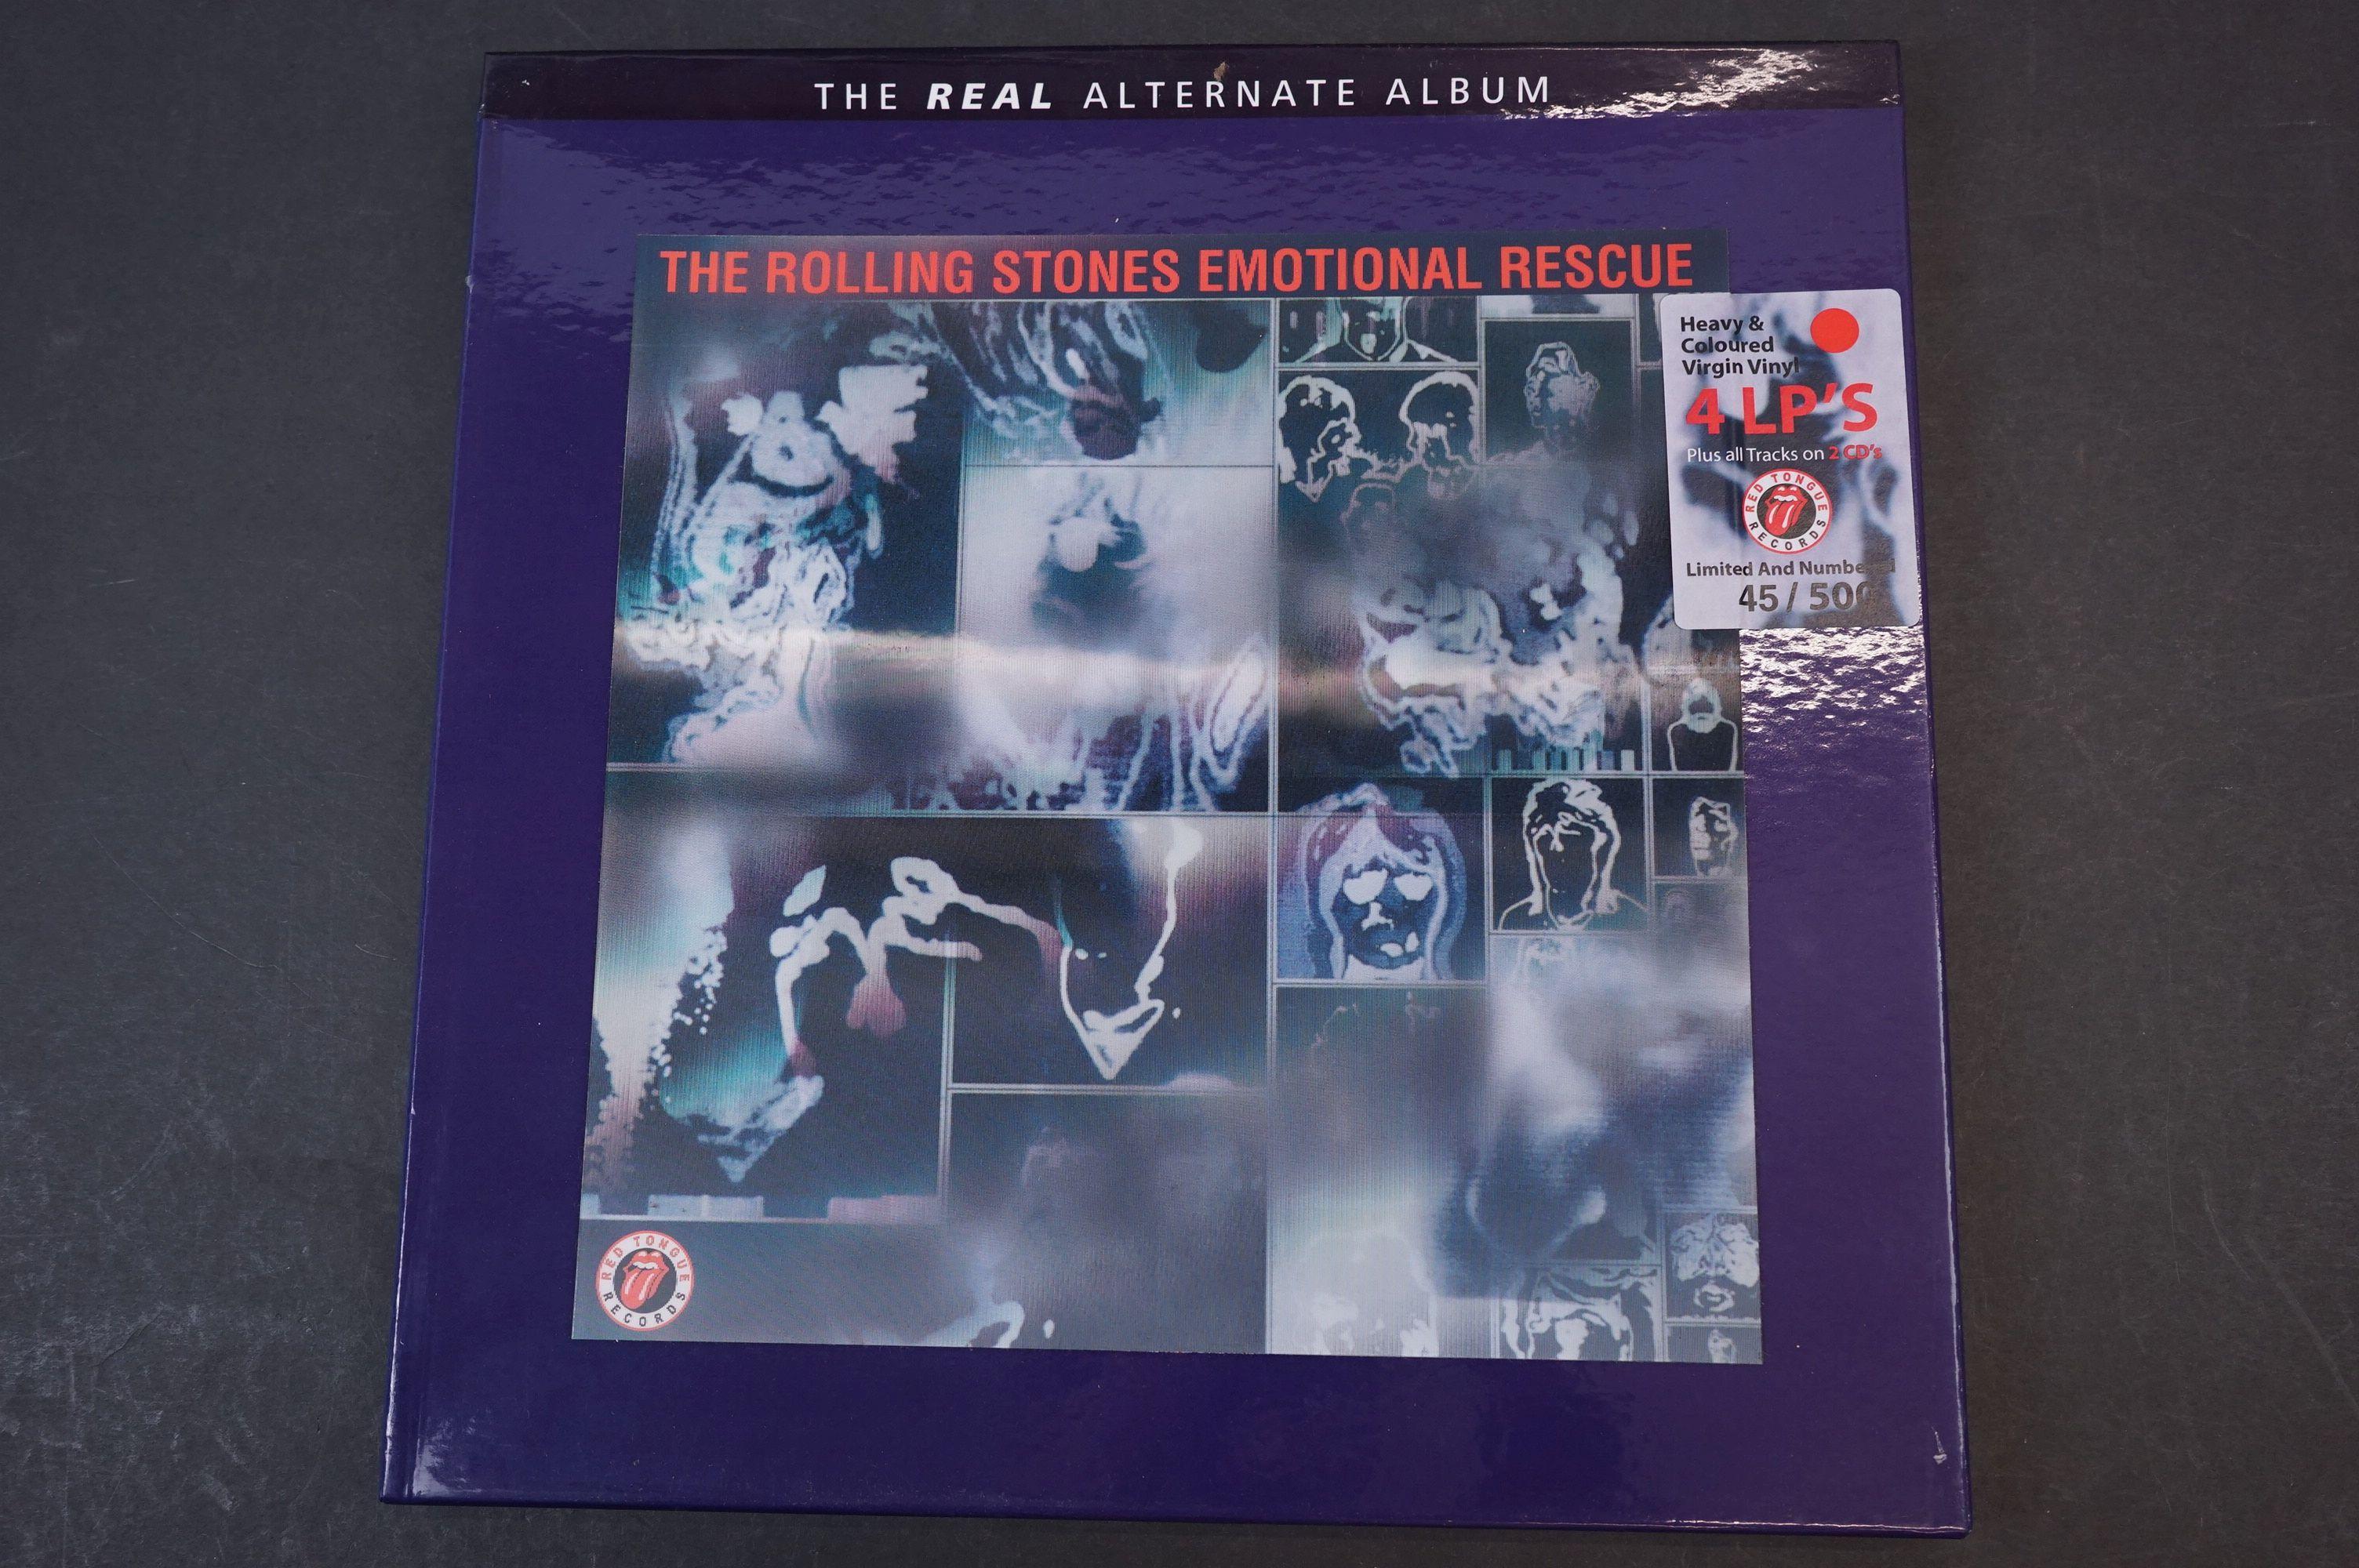 Vinyl - ltd edn The Real Alternate Album Rolling Stones Emotional Rescue 4 LP / 2 CD Box Set,